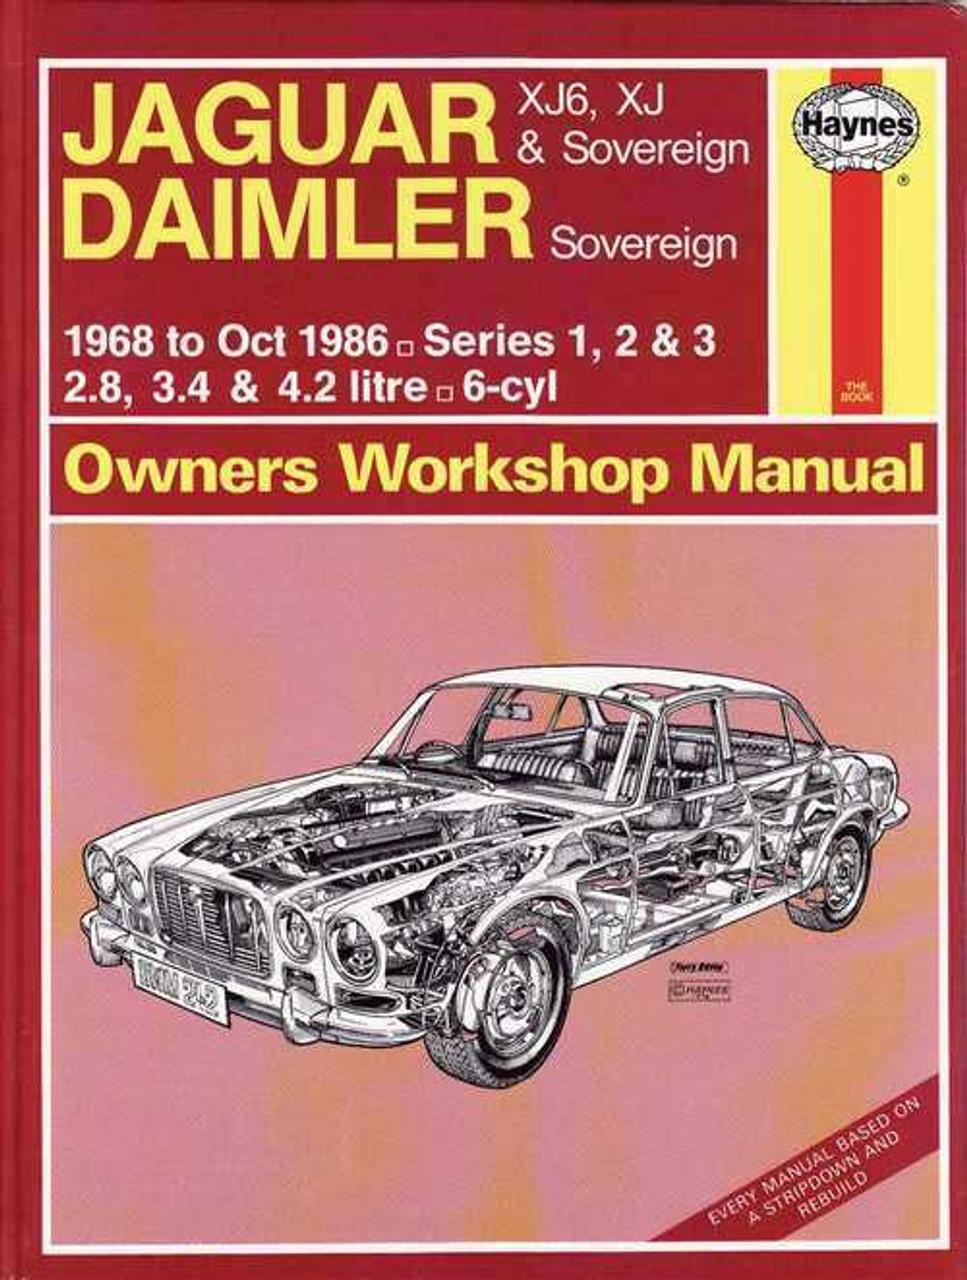 jaguar xj6 xj amp sovereign amp daimler sovereign 1968 1986 rh automotobookshop com au jaguar xj8 x308 workshop and parts manual jaguar xj8 workshop manual pdf